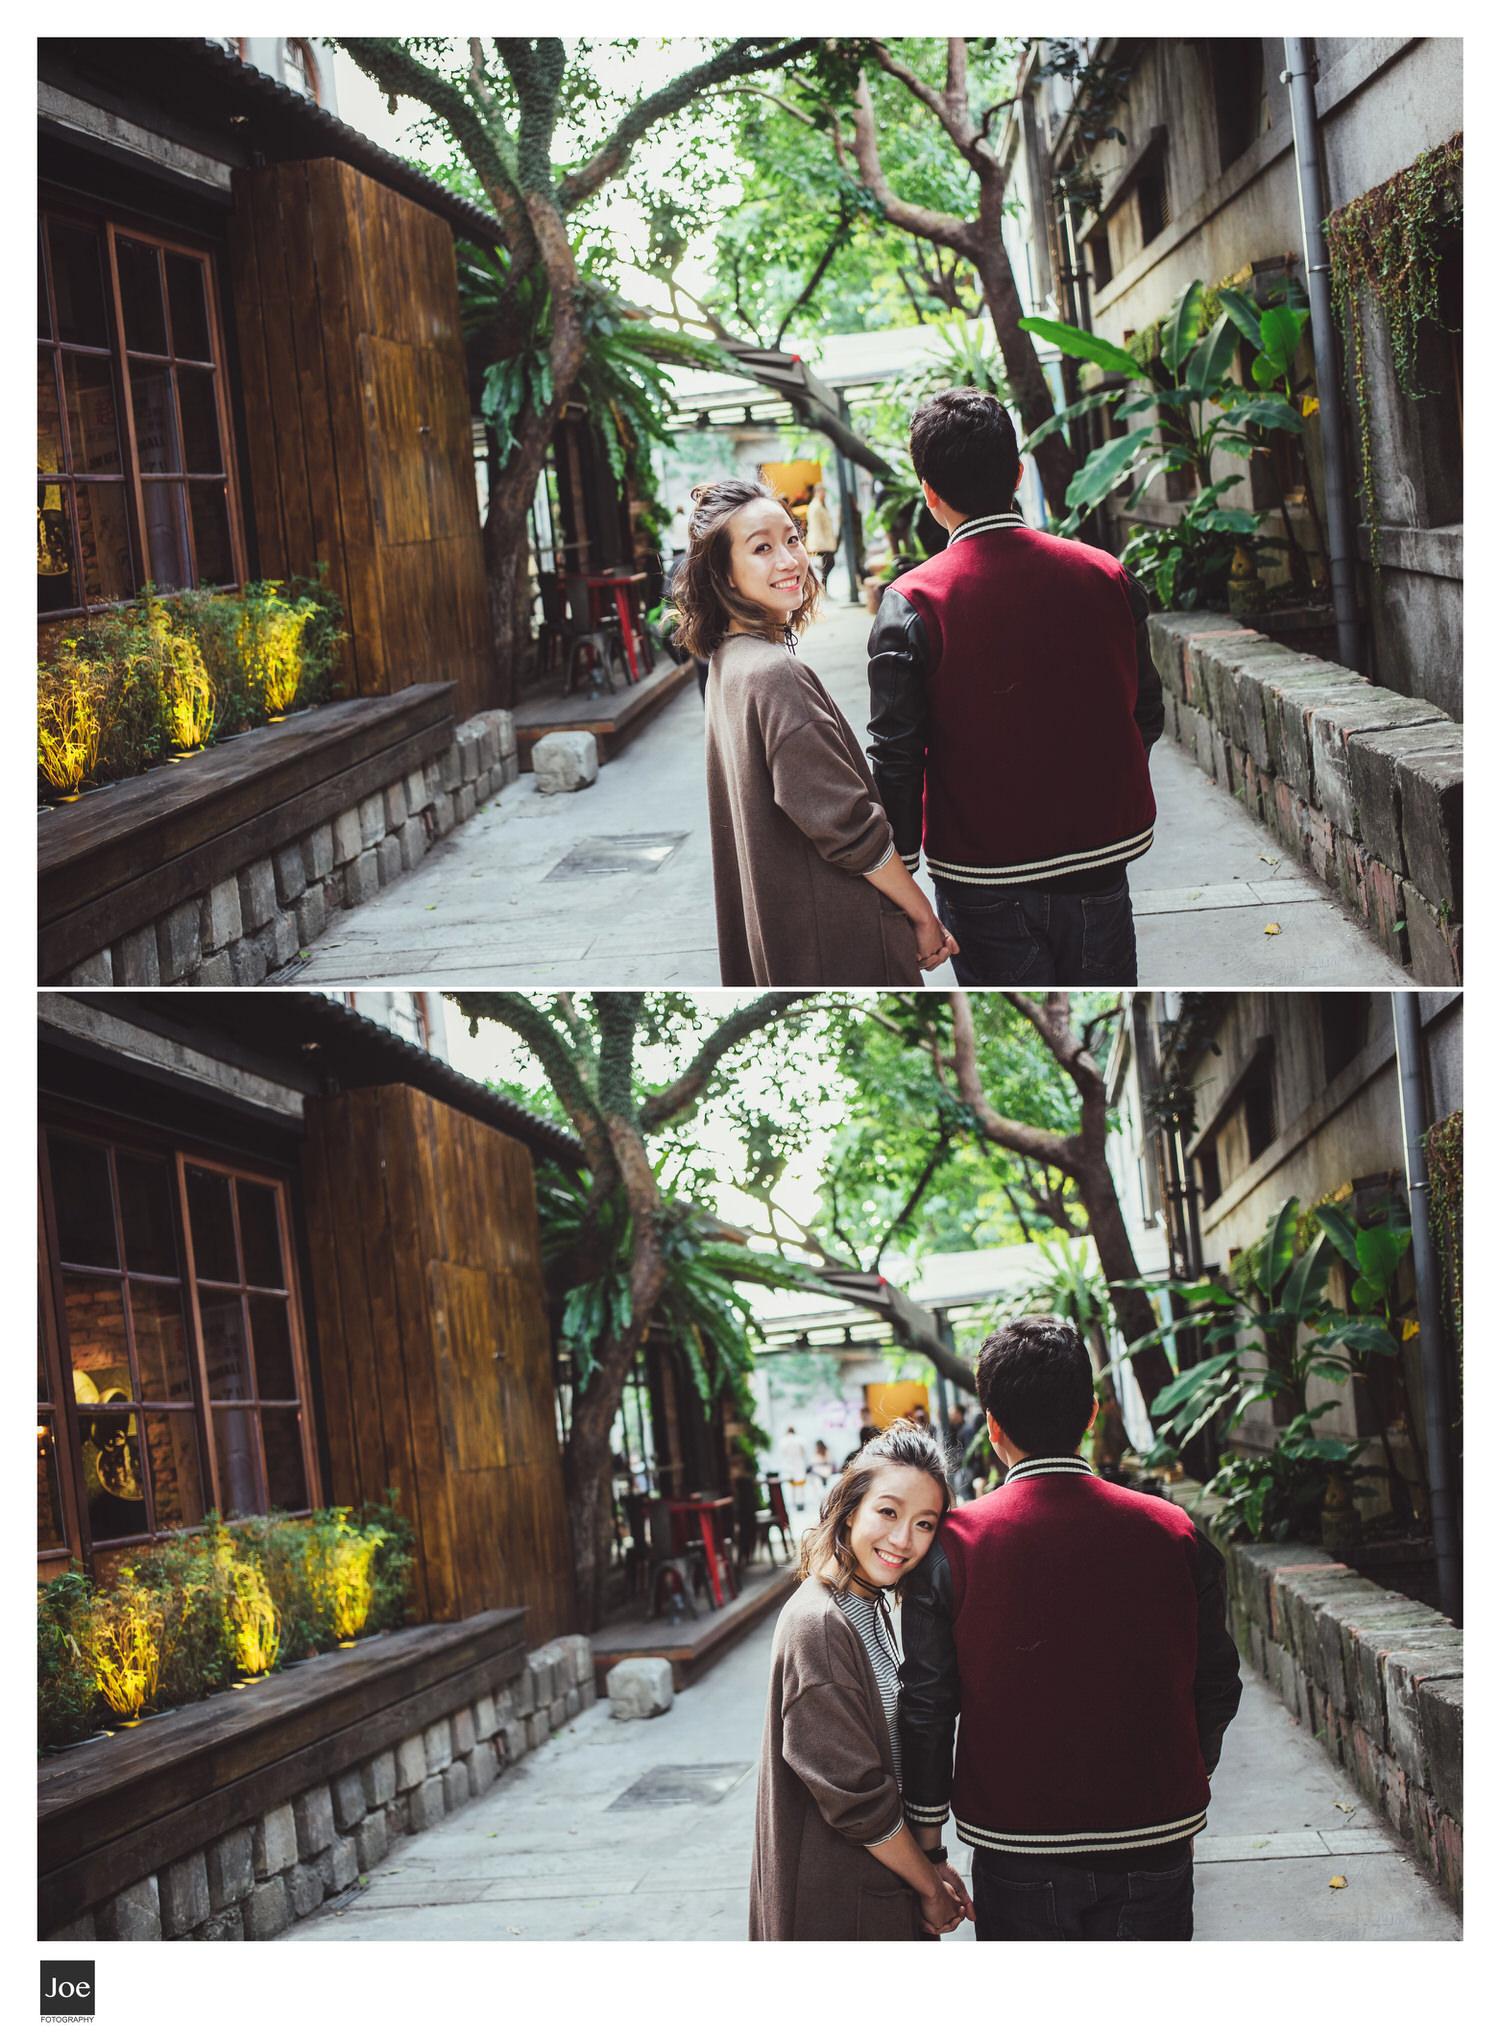 joefotography-taiwan-pre-wedding-annie-aaron-53.jpg